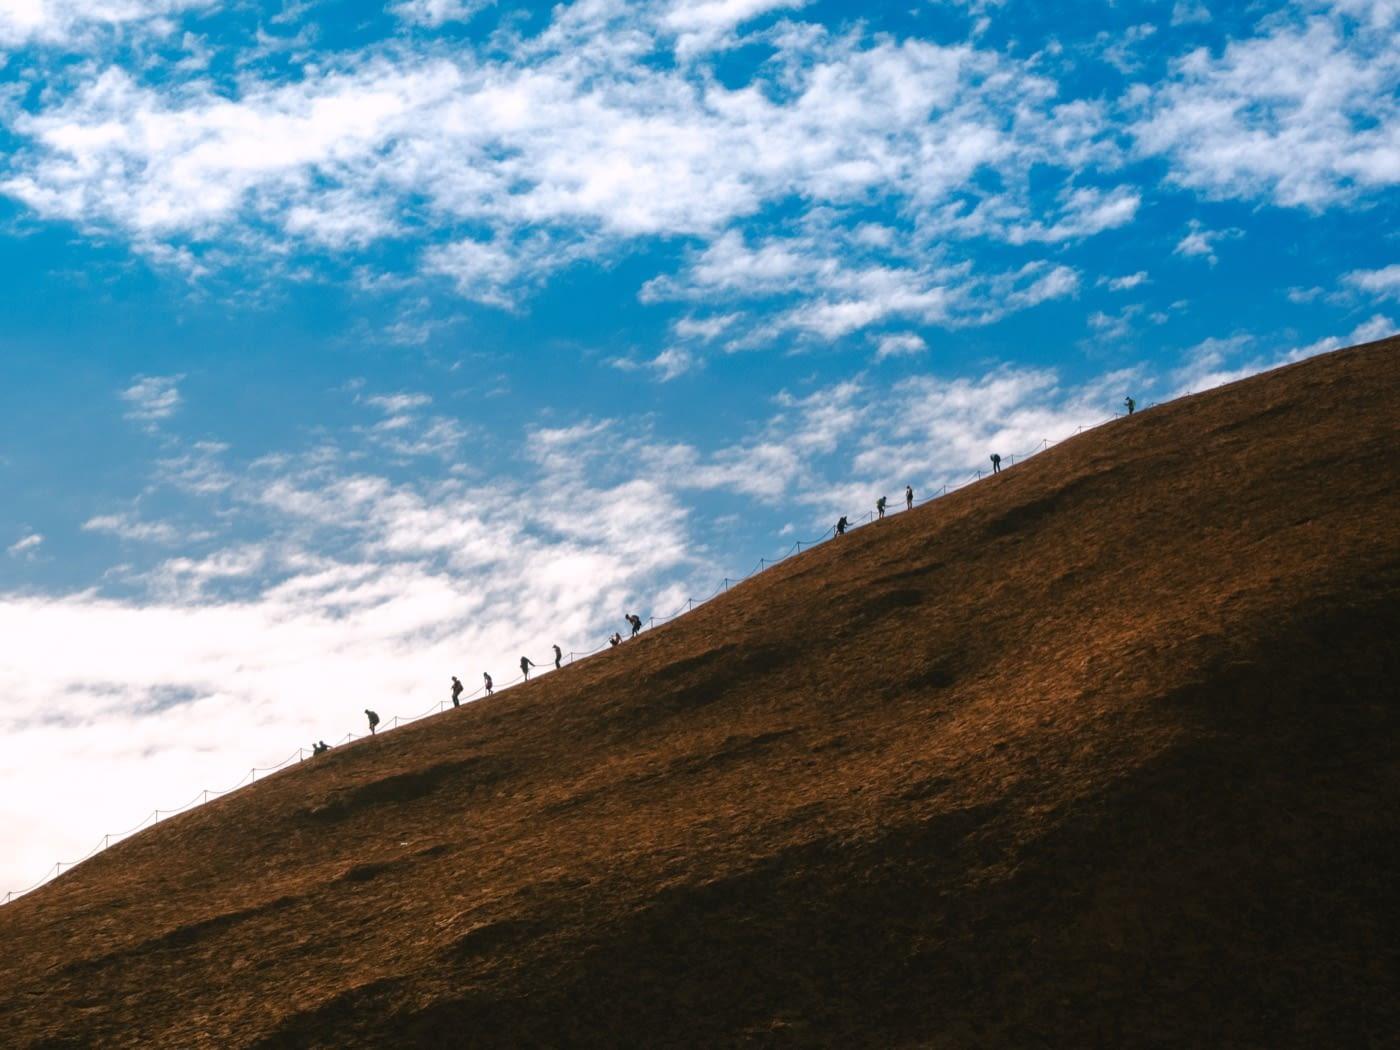 NT Australia - More tourist climbing Uluru